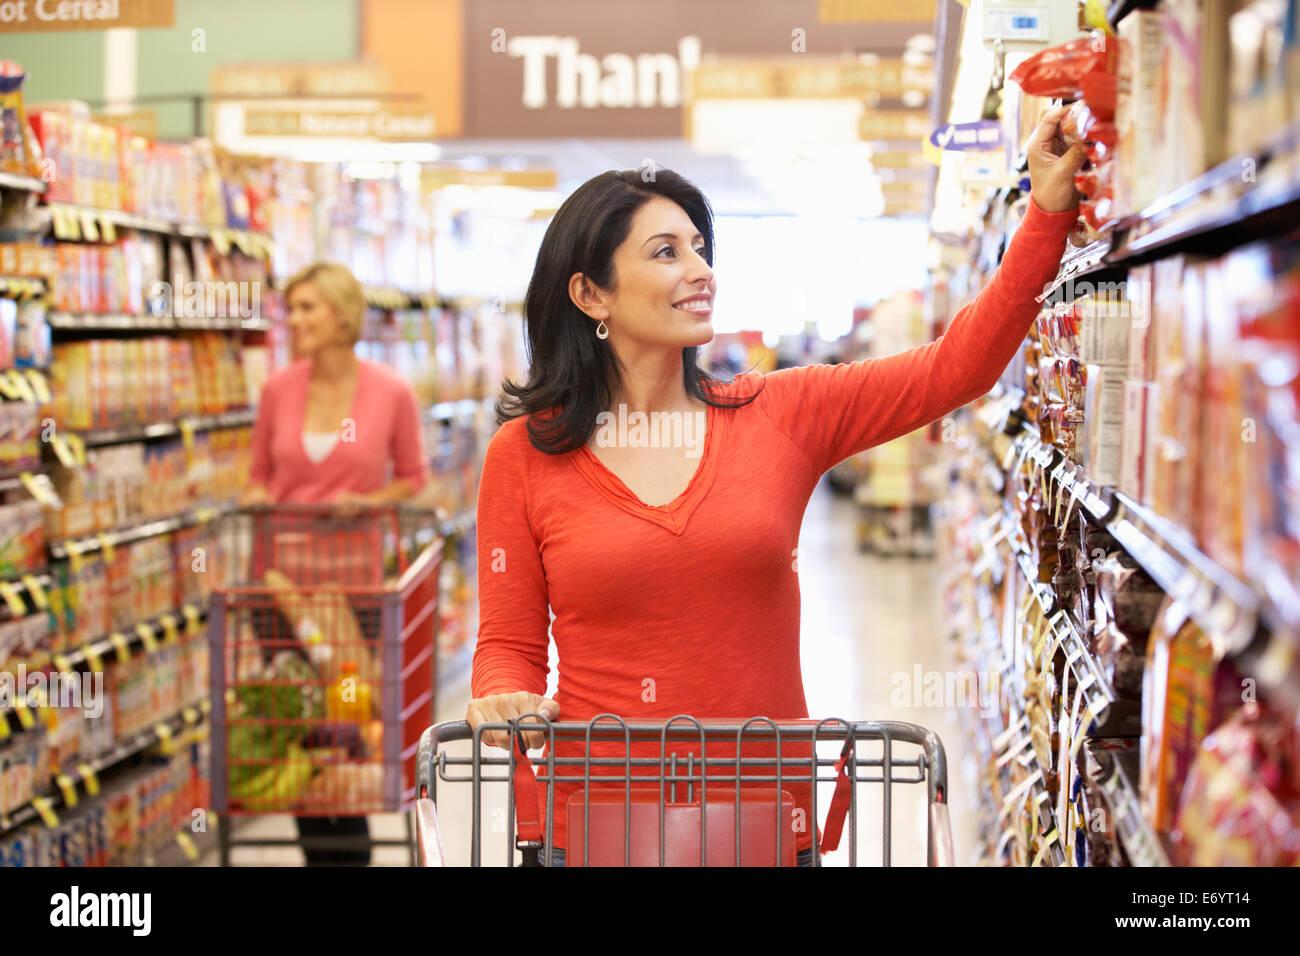 55e198e486 Frauen im Supermarkt einkaufen Stockfoto, Bild: 73140960 - Alamy